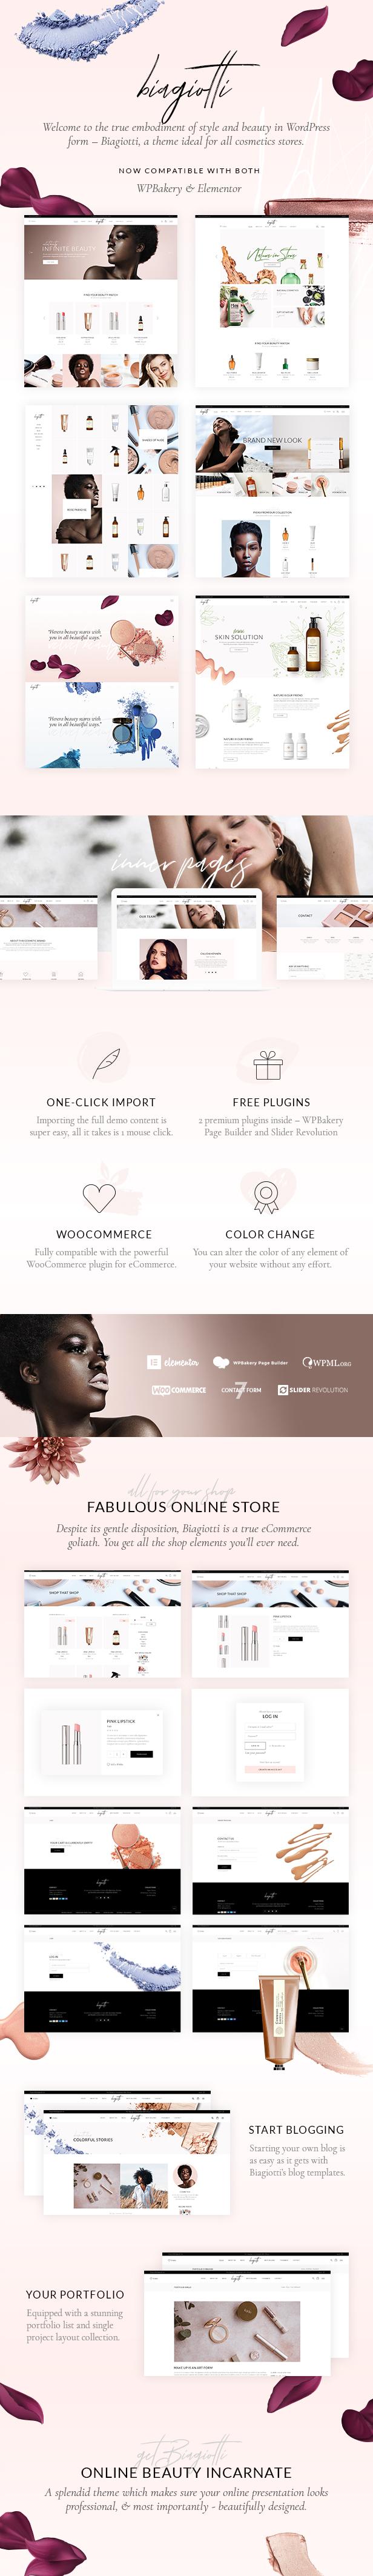 01b - Biagiotti - Beauty and Cosmetics Shop